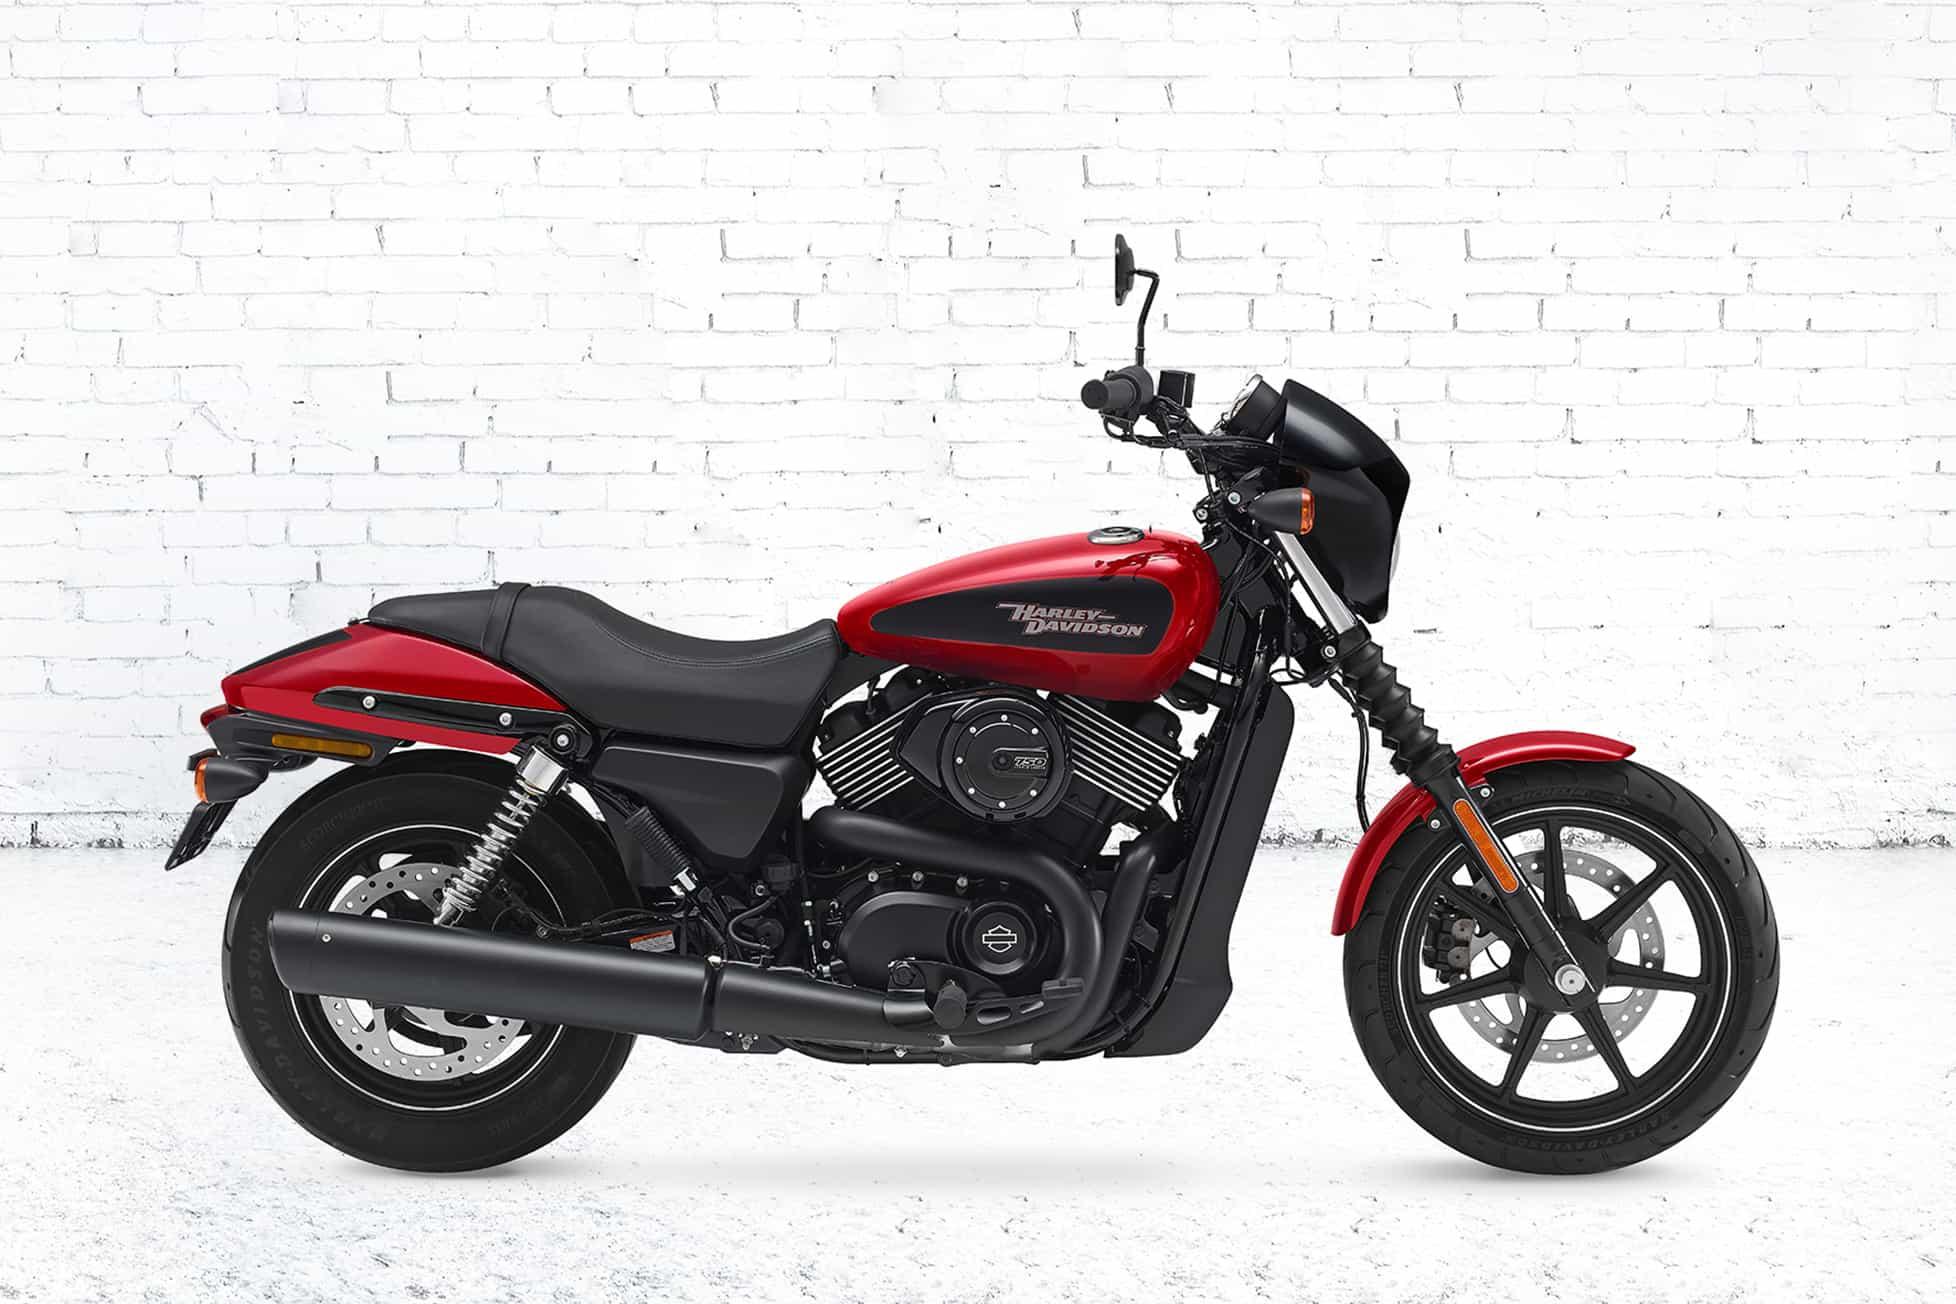 2018 street 750 specs pricing harley davidson india rh harley davidson com